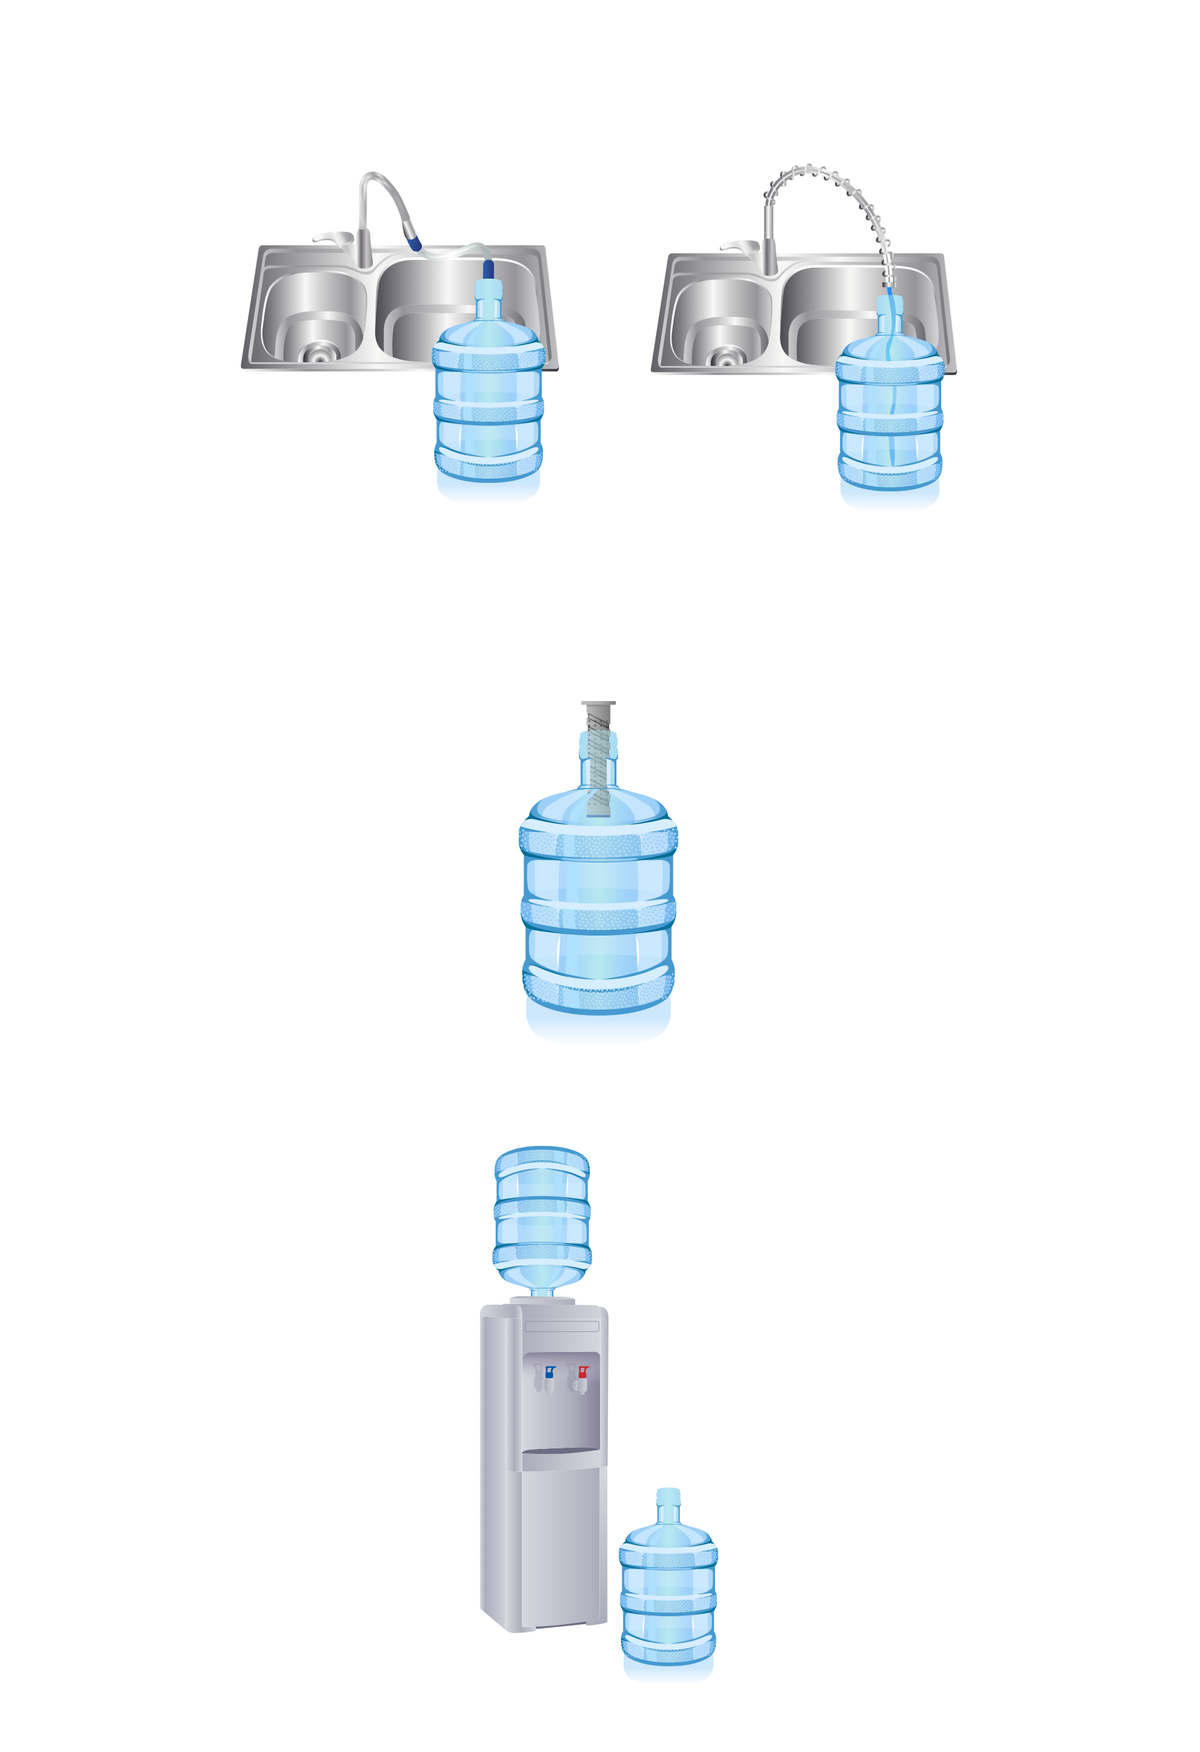 Kickstarter graphics